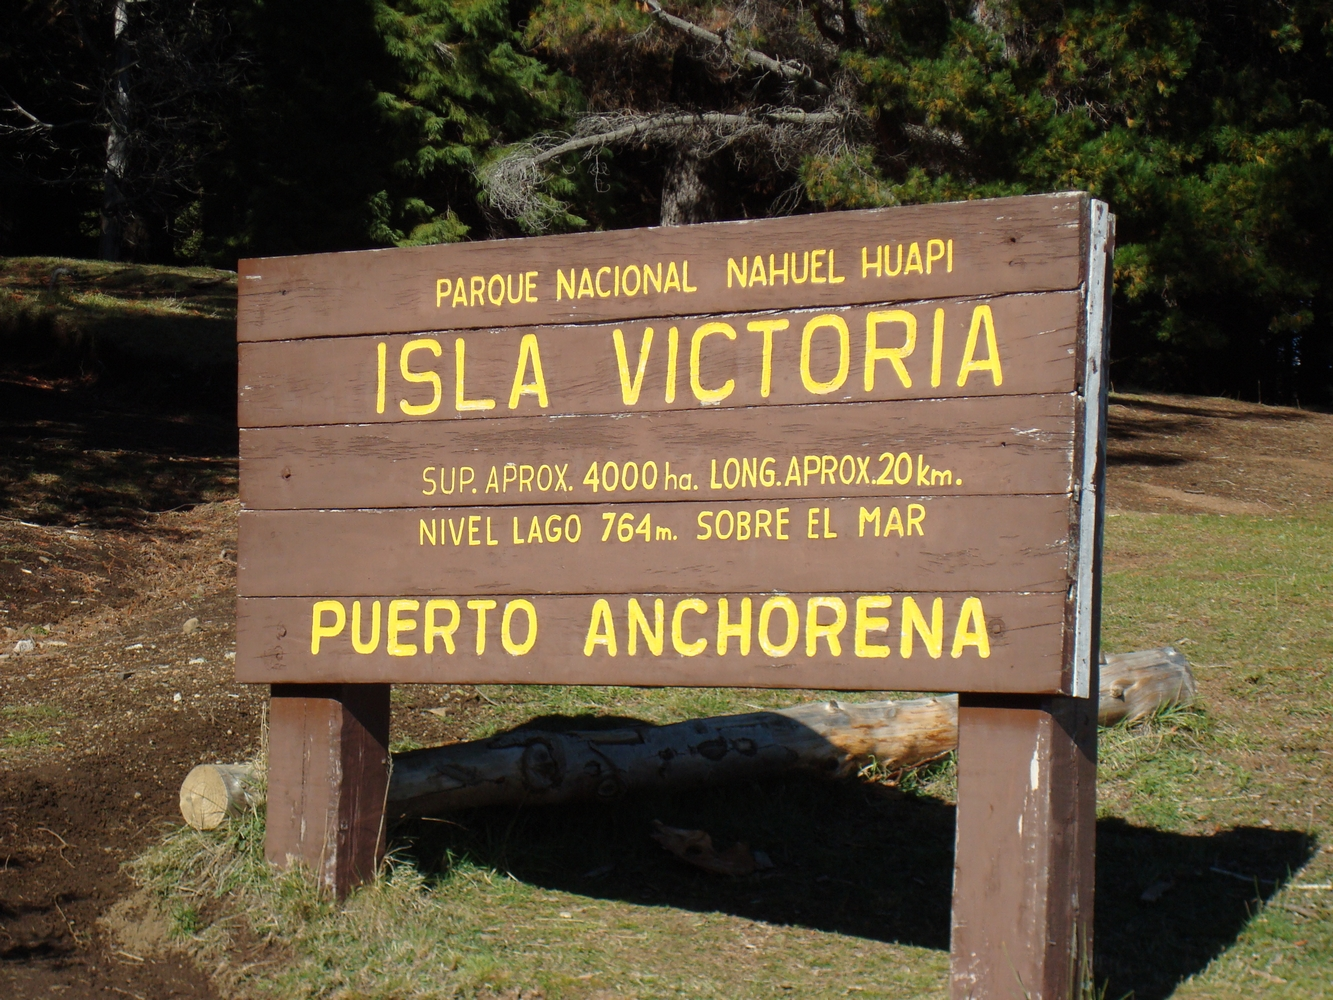 Île Victoria